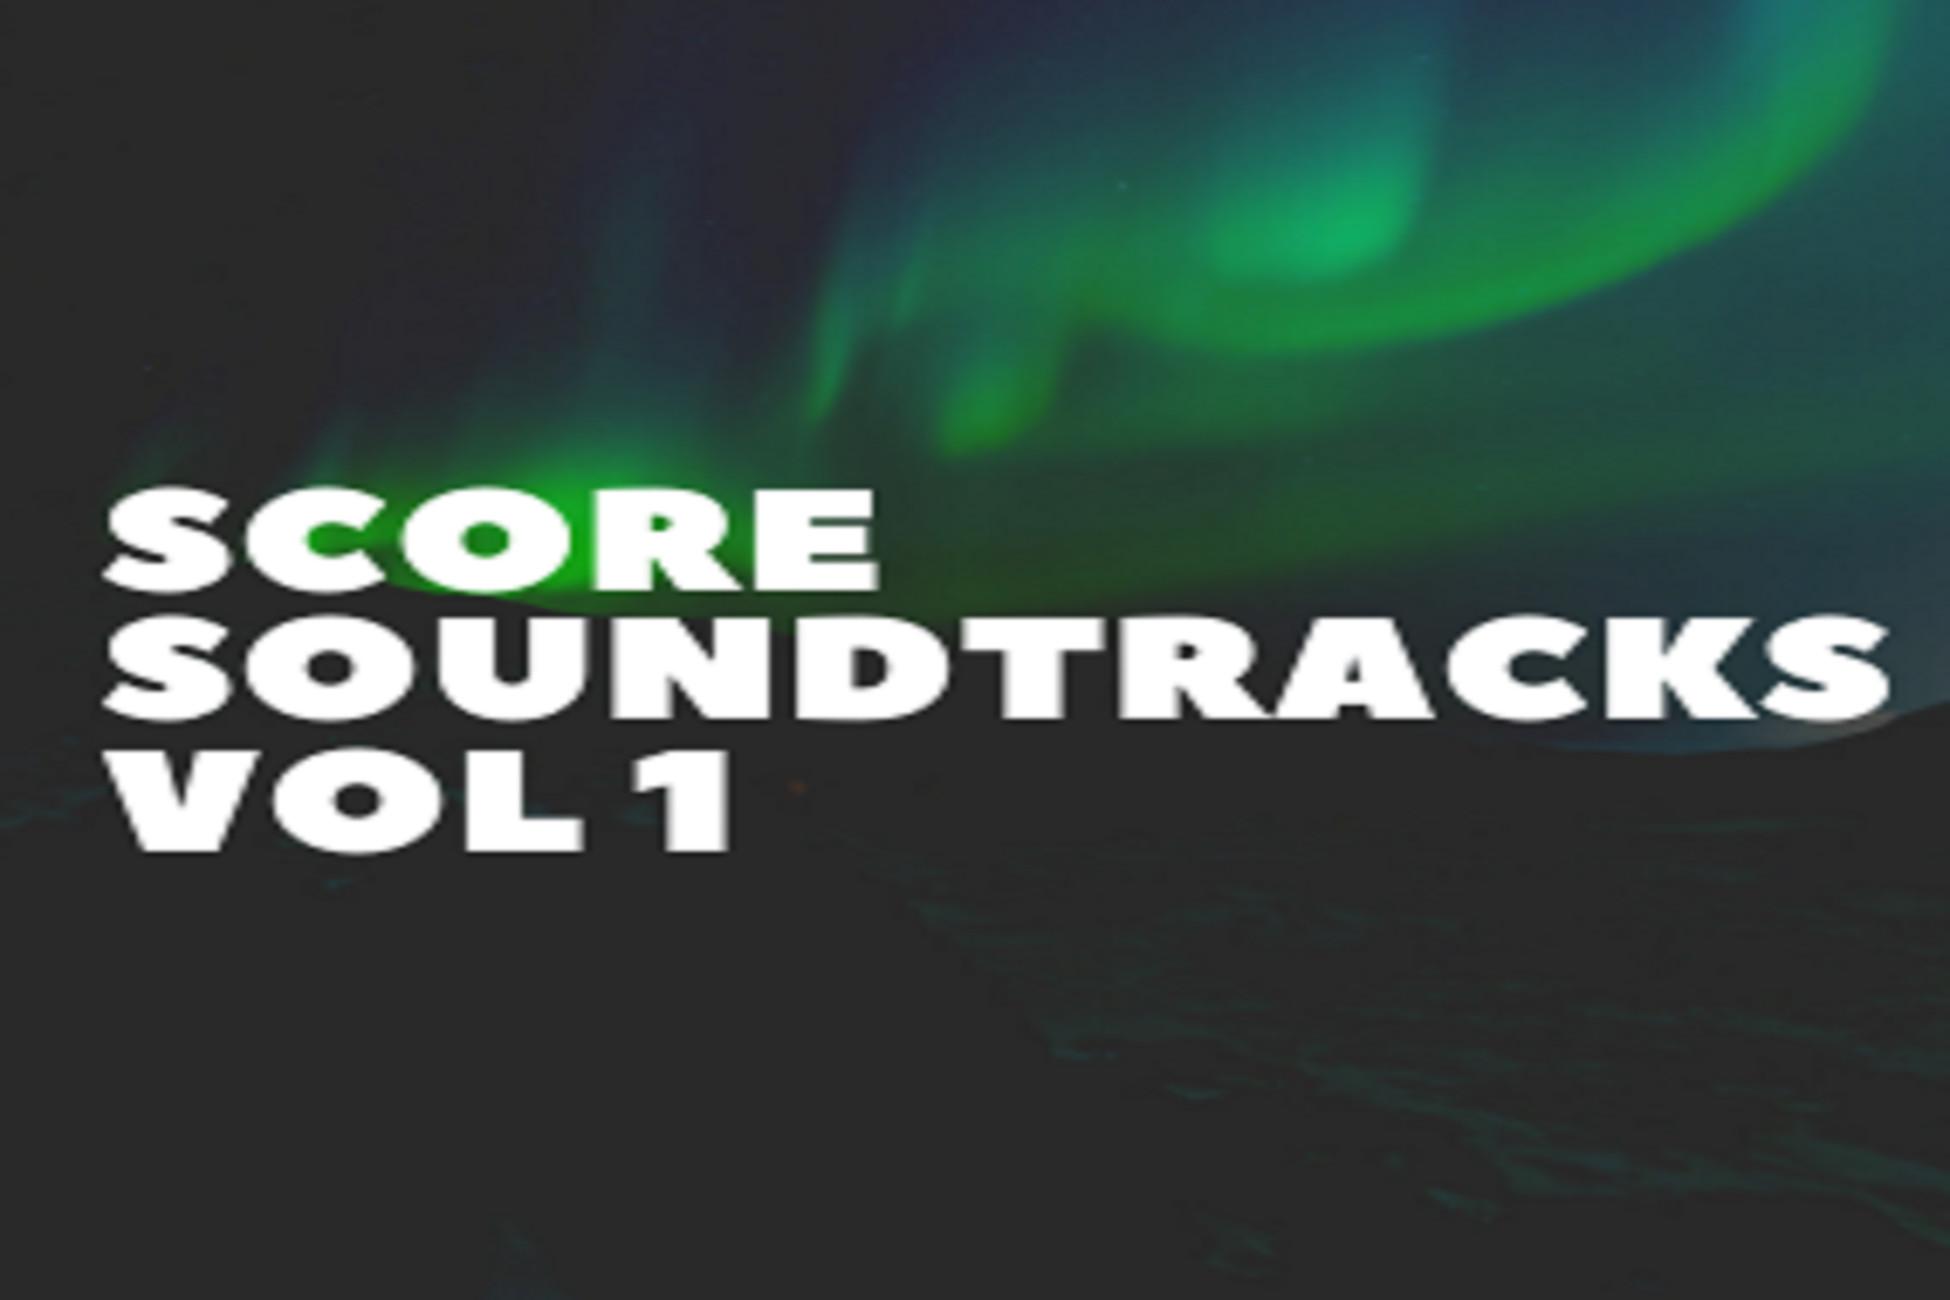 Score Soundtracks Vol 1